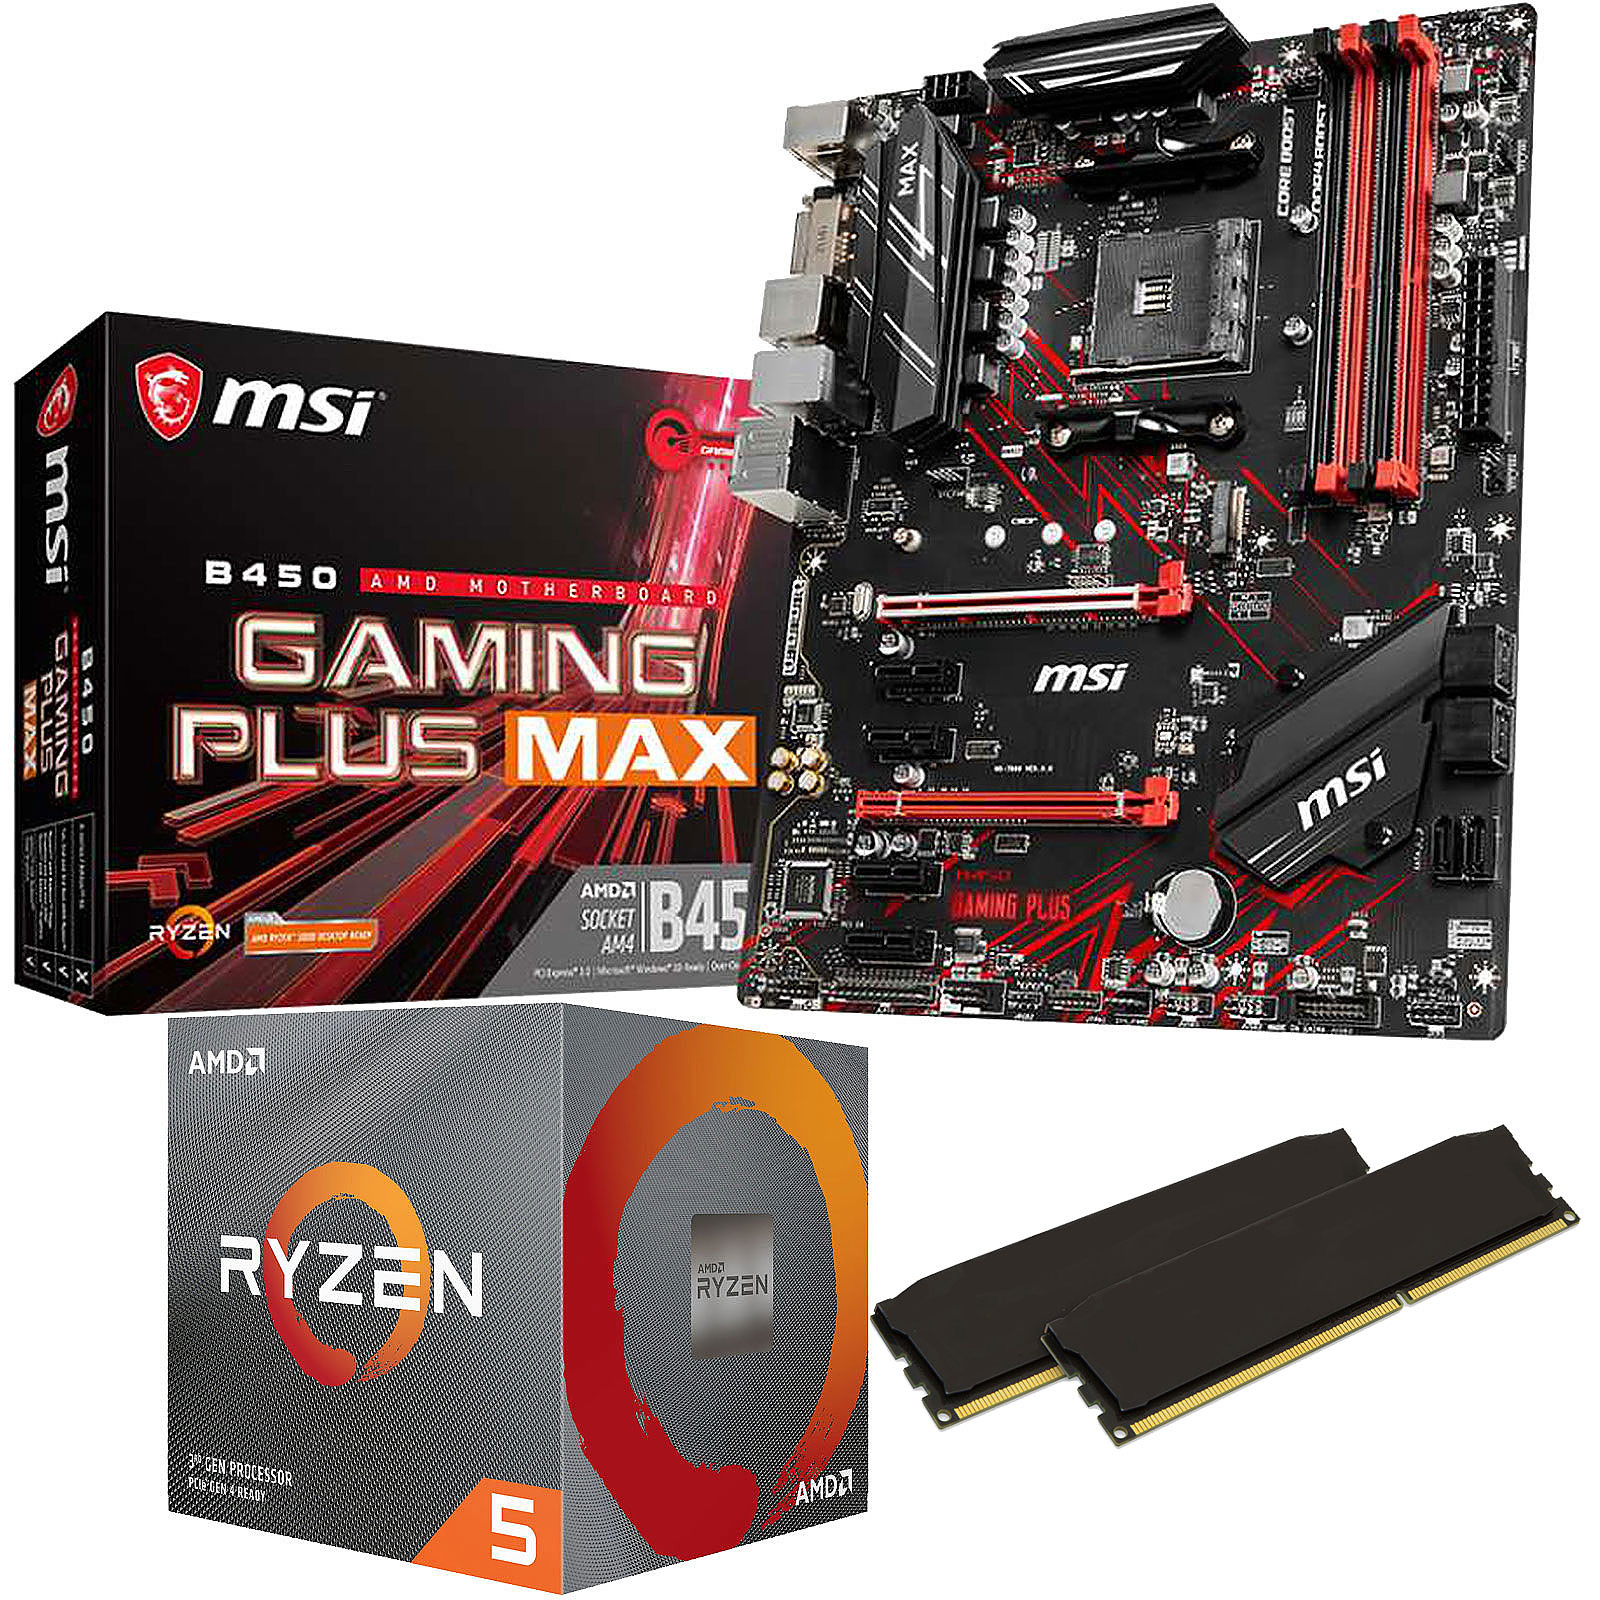 Kit Upgrade PC AMD Ryzen 5 3600 MSI B450 GAMING PLUS MAX 16 Go